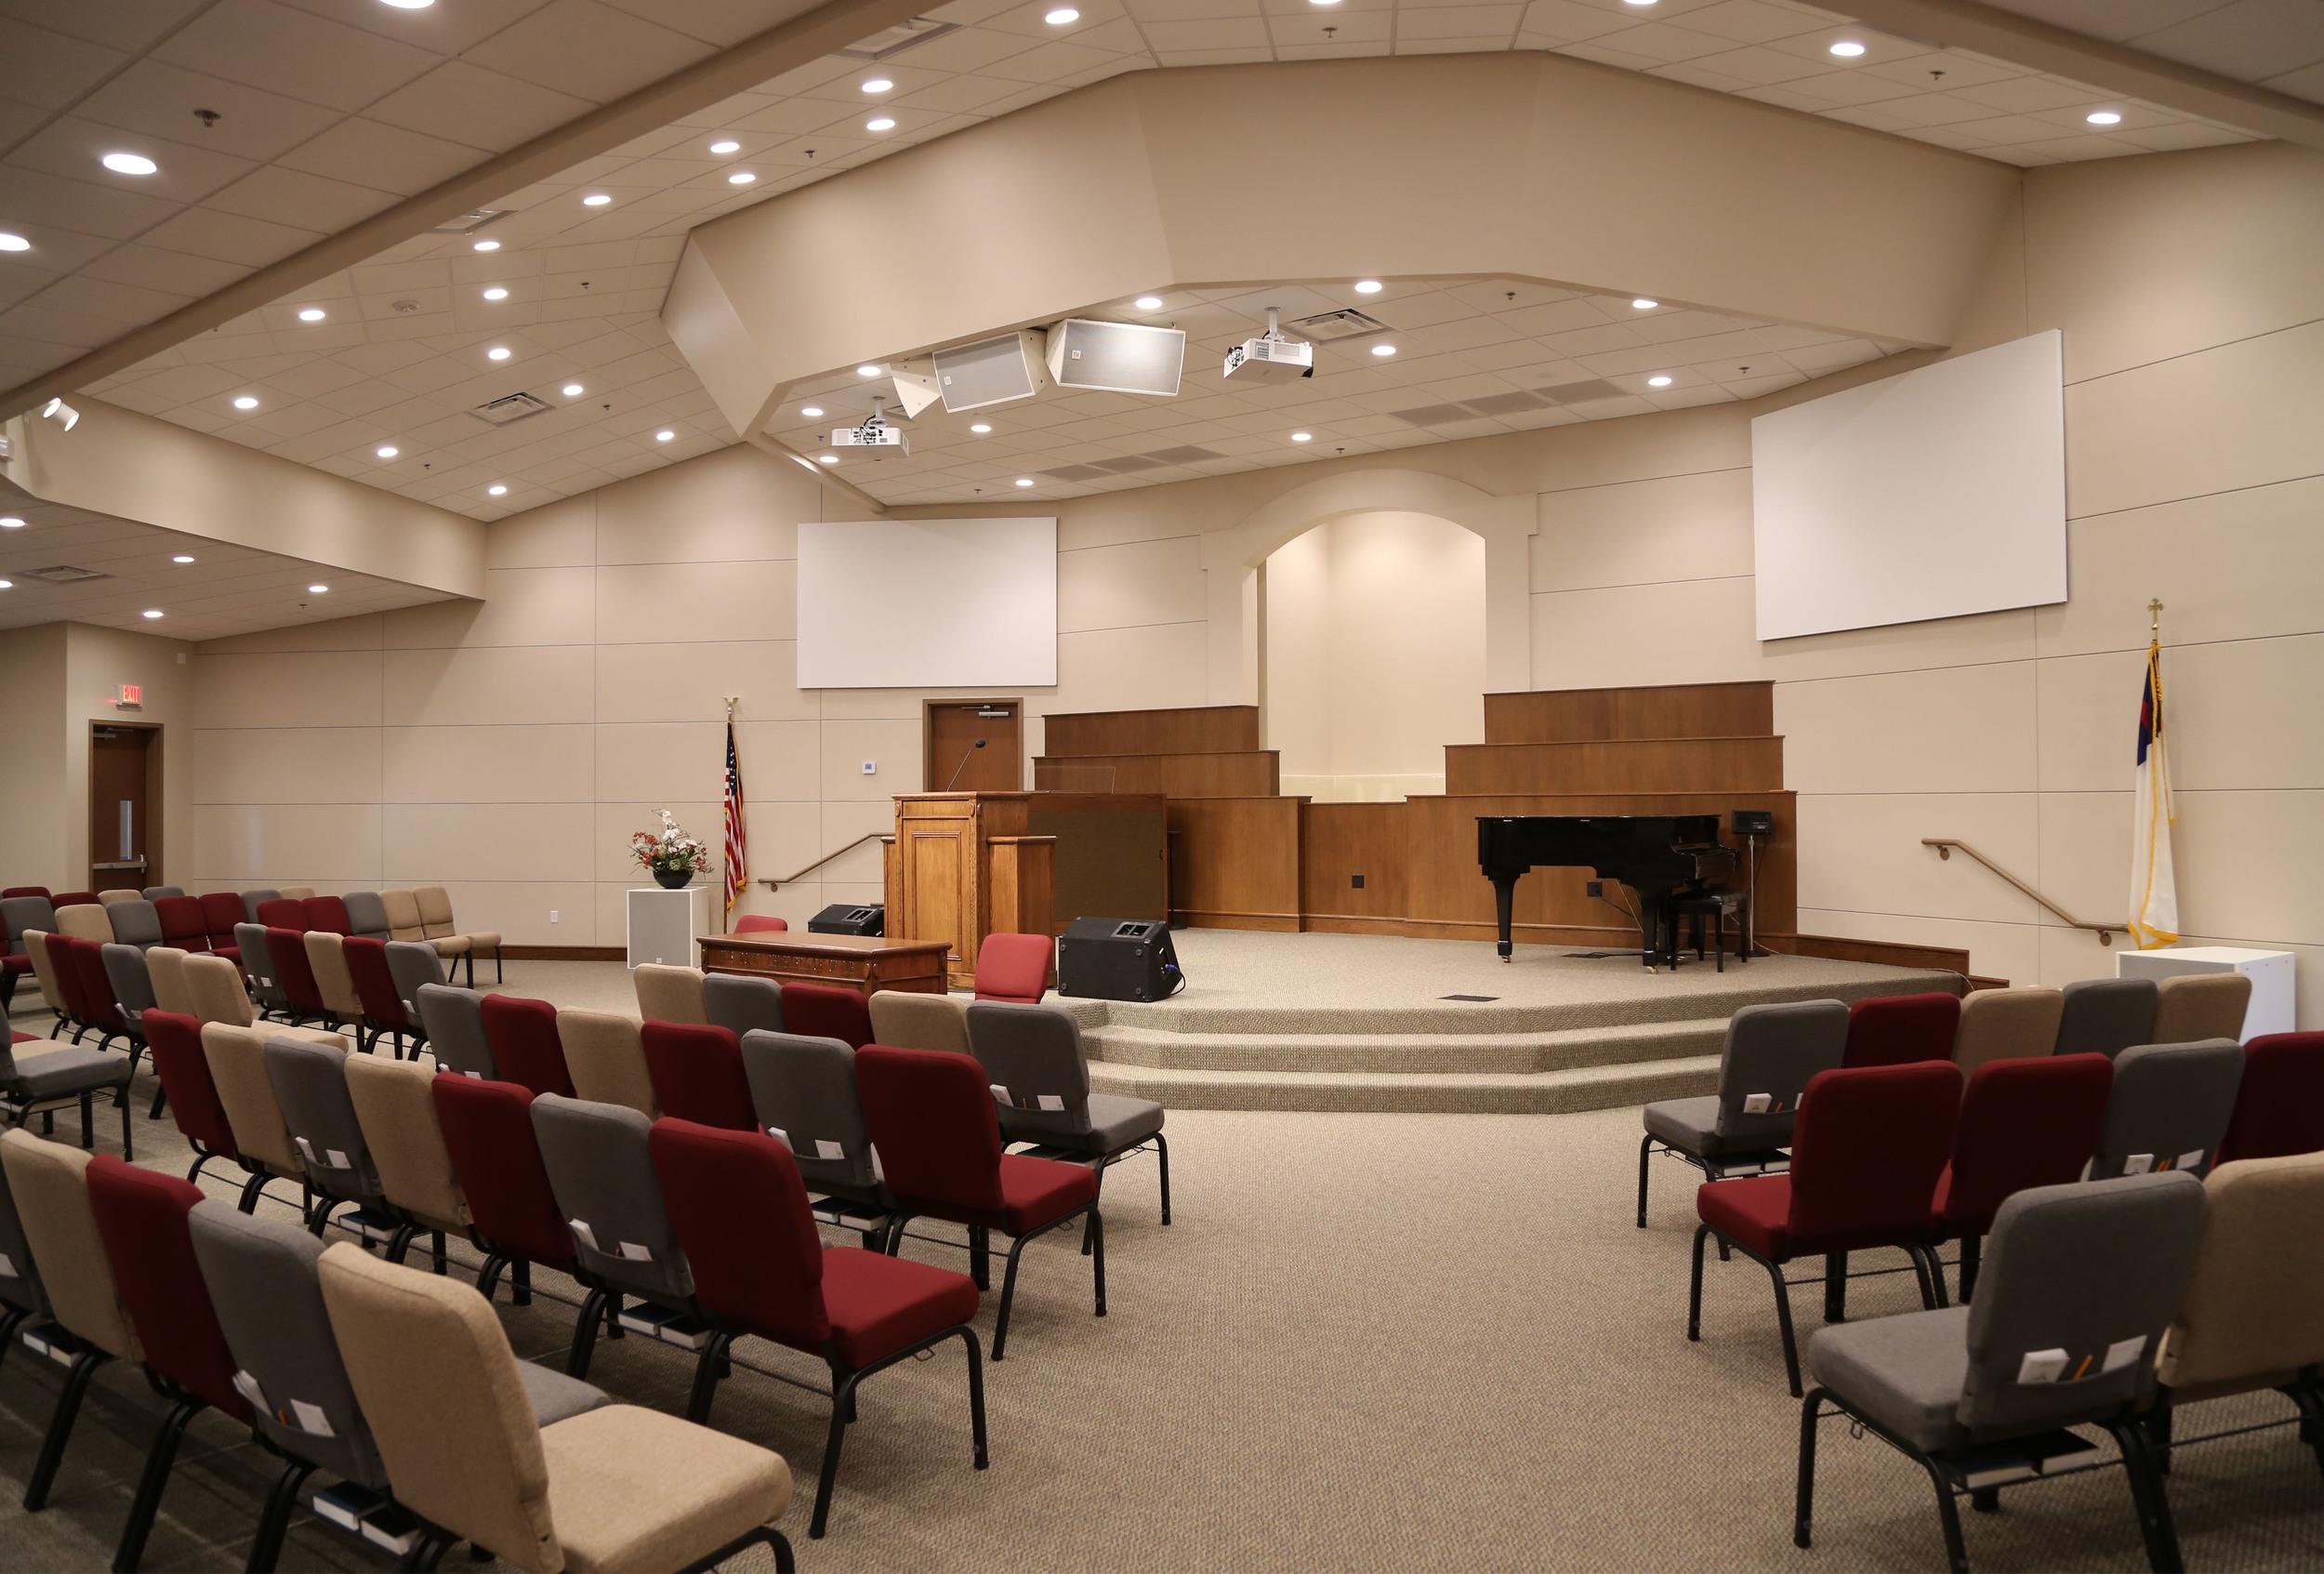 ESDA Interior 06 - Worship Center 04 copy.jpg